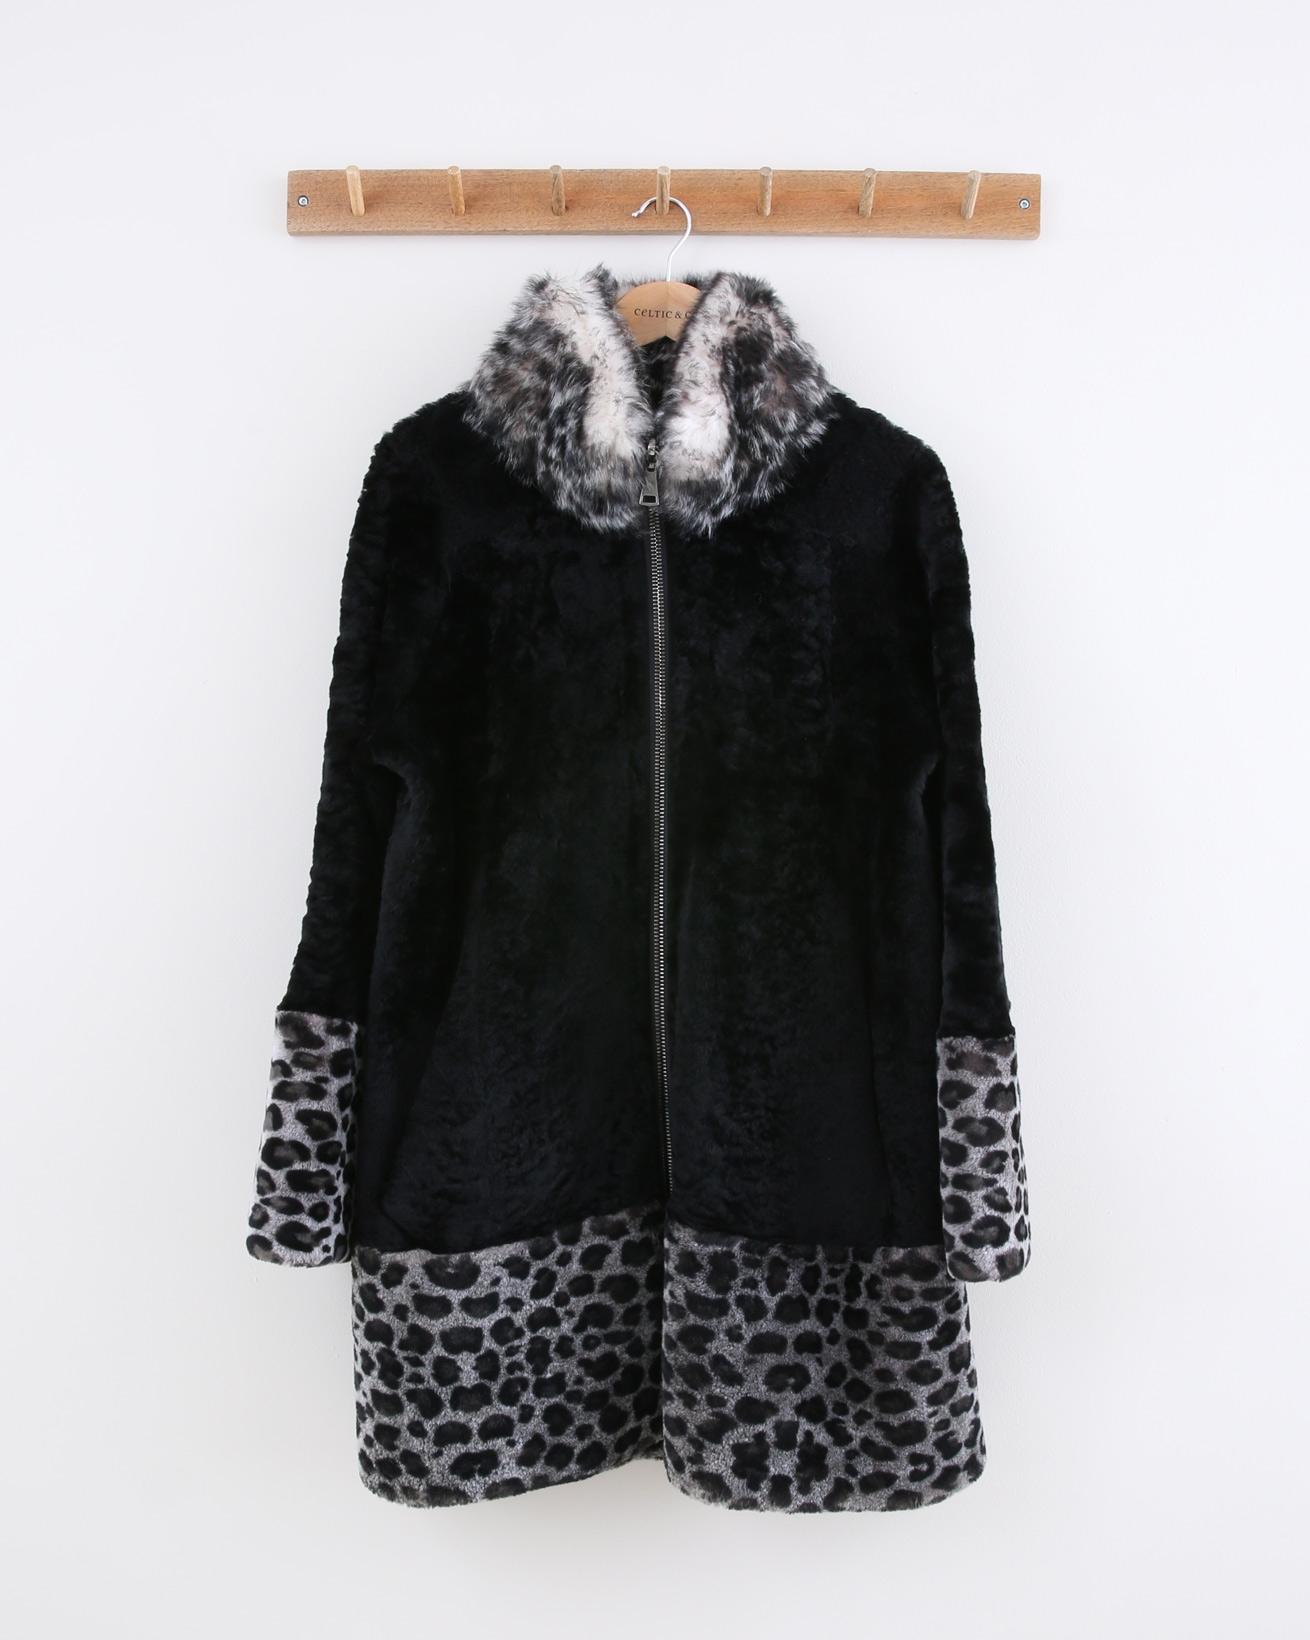 Statement Swing Coat -Size 10 - Black Snow Leopard - 1484